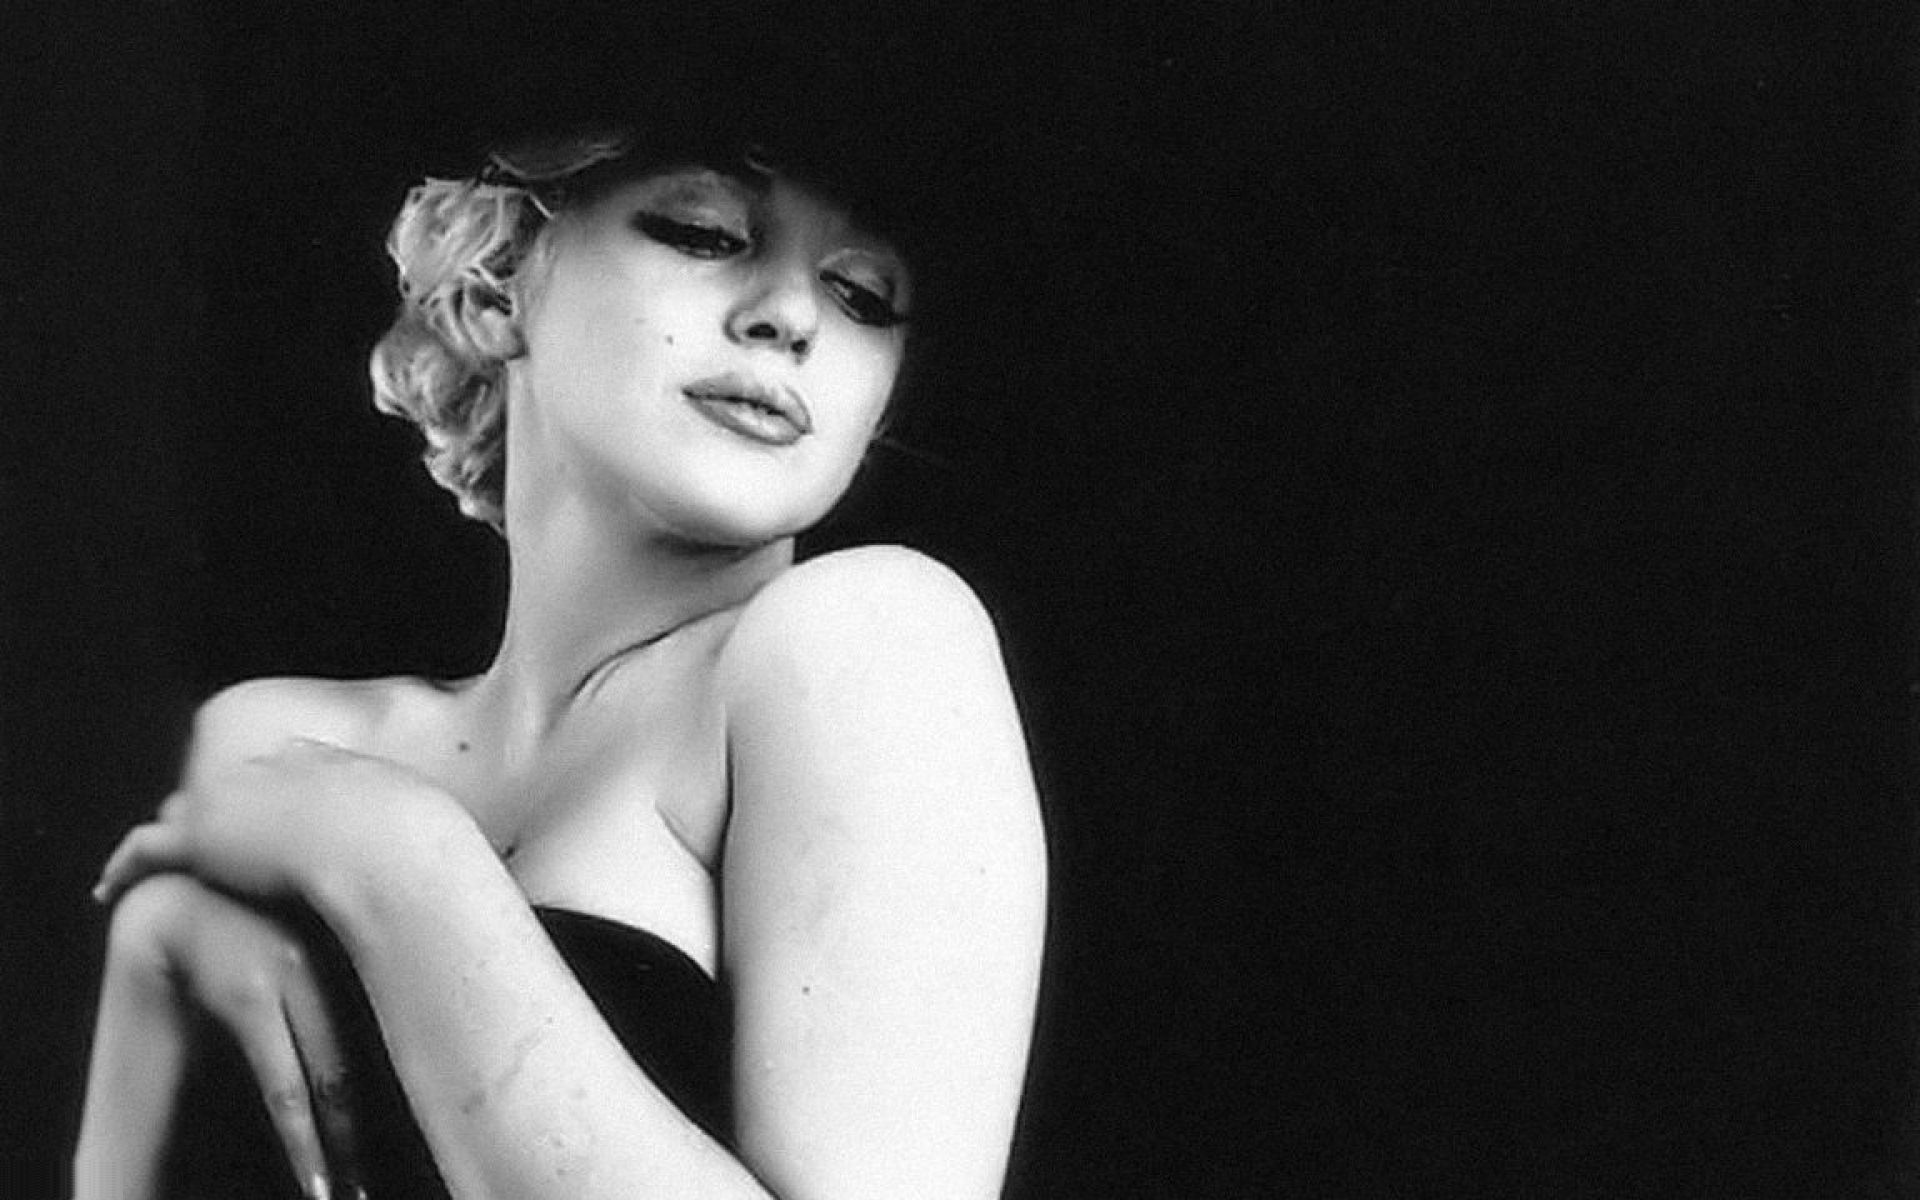 Marilyn Monroe Wallpaper 15 Cute Collection Marilyn Monroe